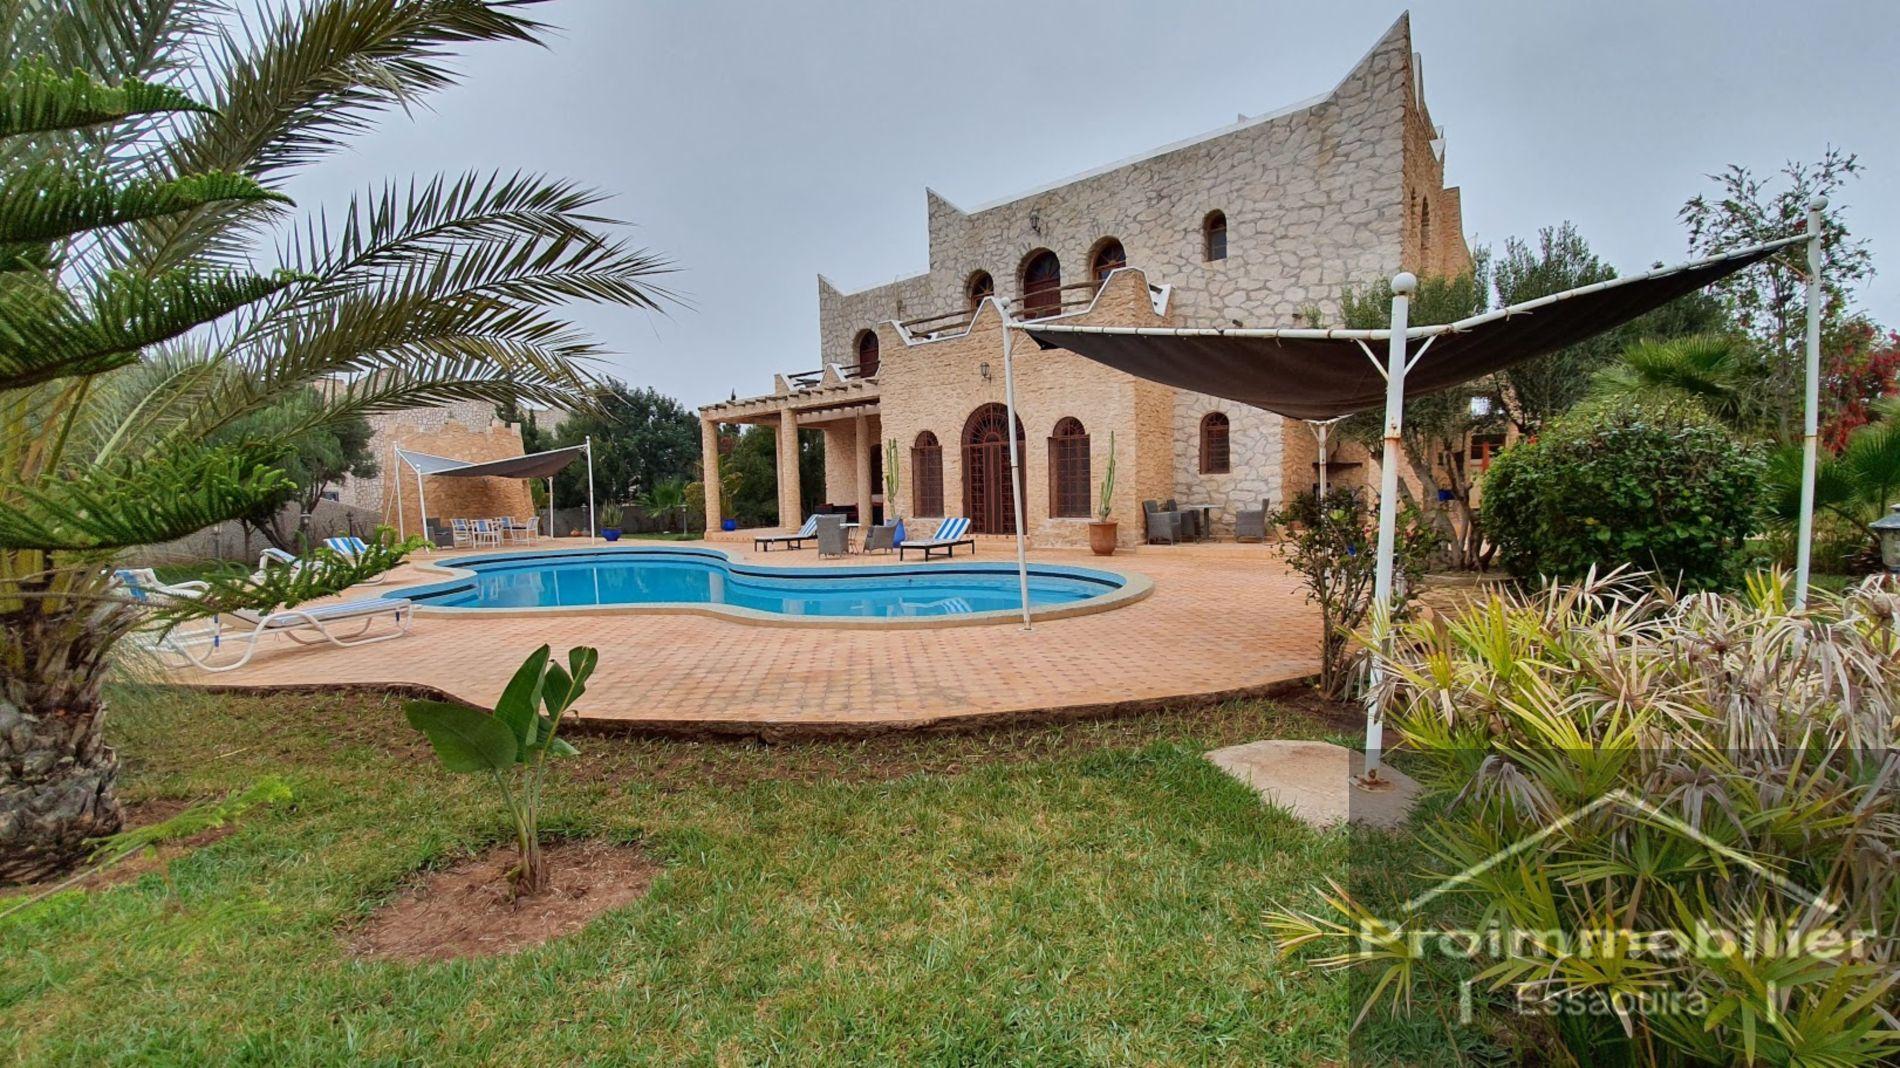 15-10-387-VV  Beautiful Villa 500m² Garden 2200m²